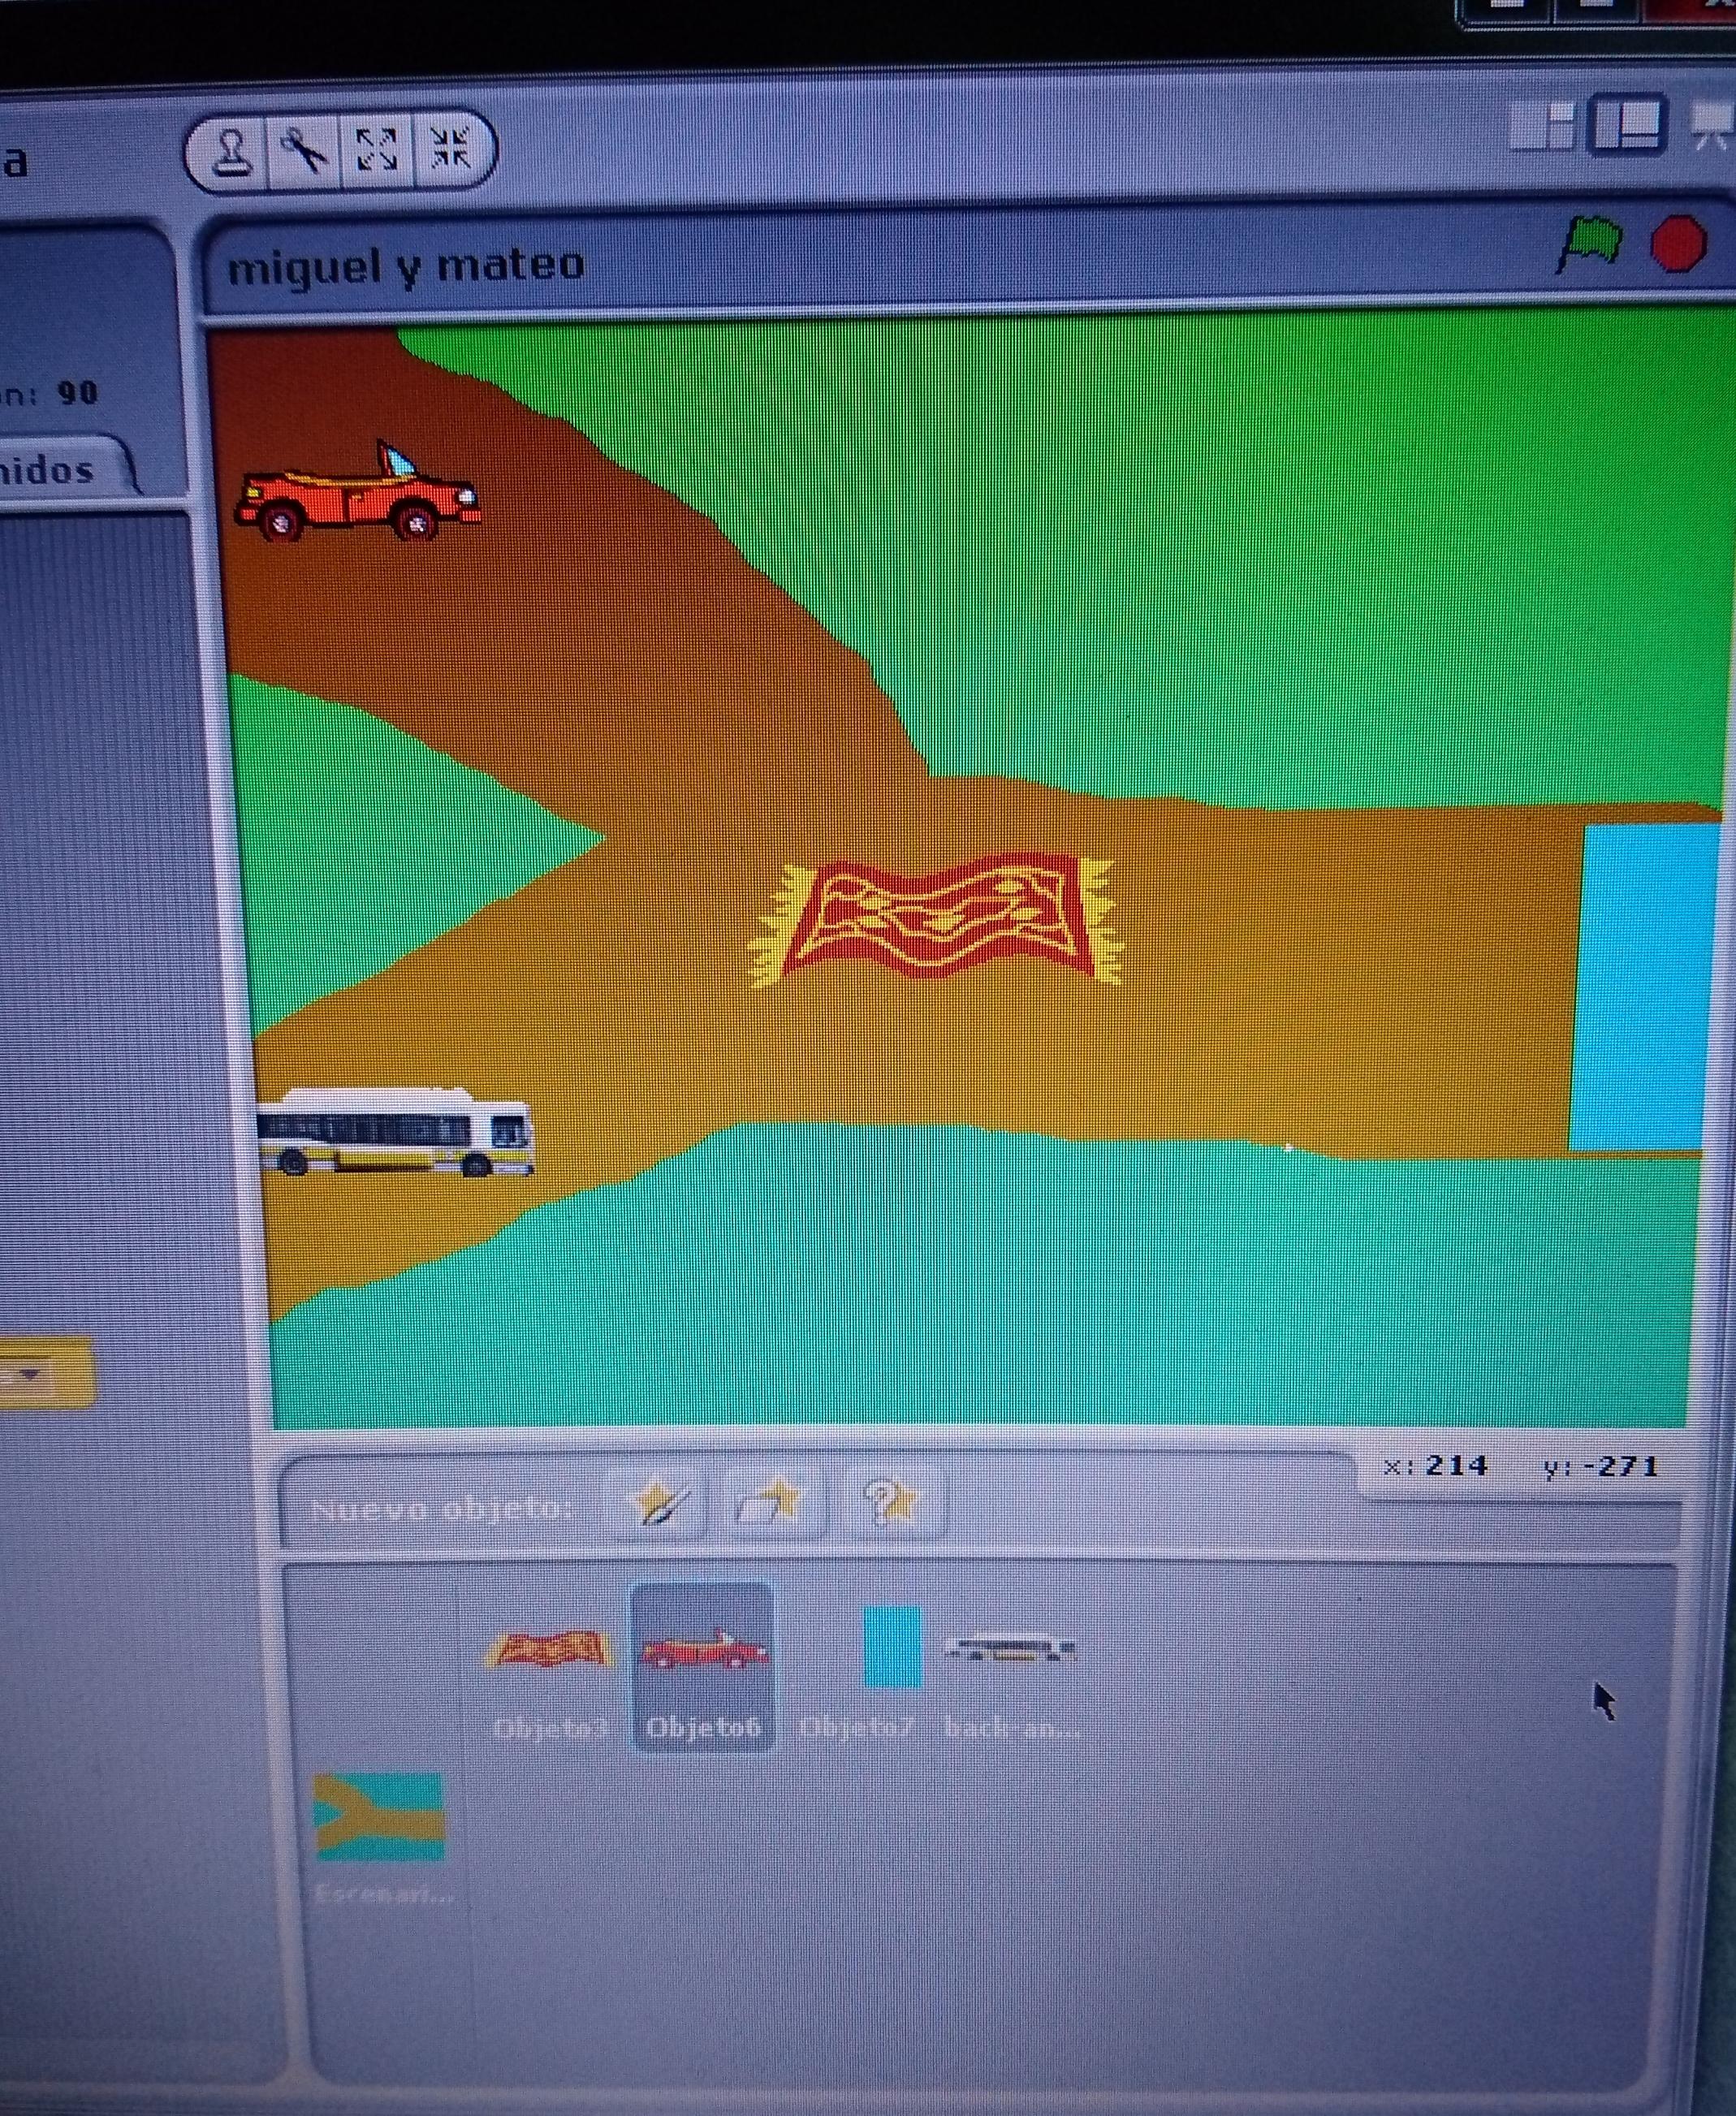 ¡Creando un videojuego!